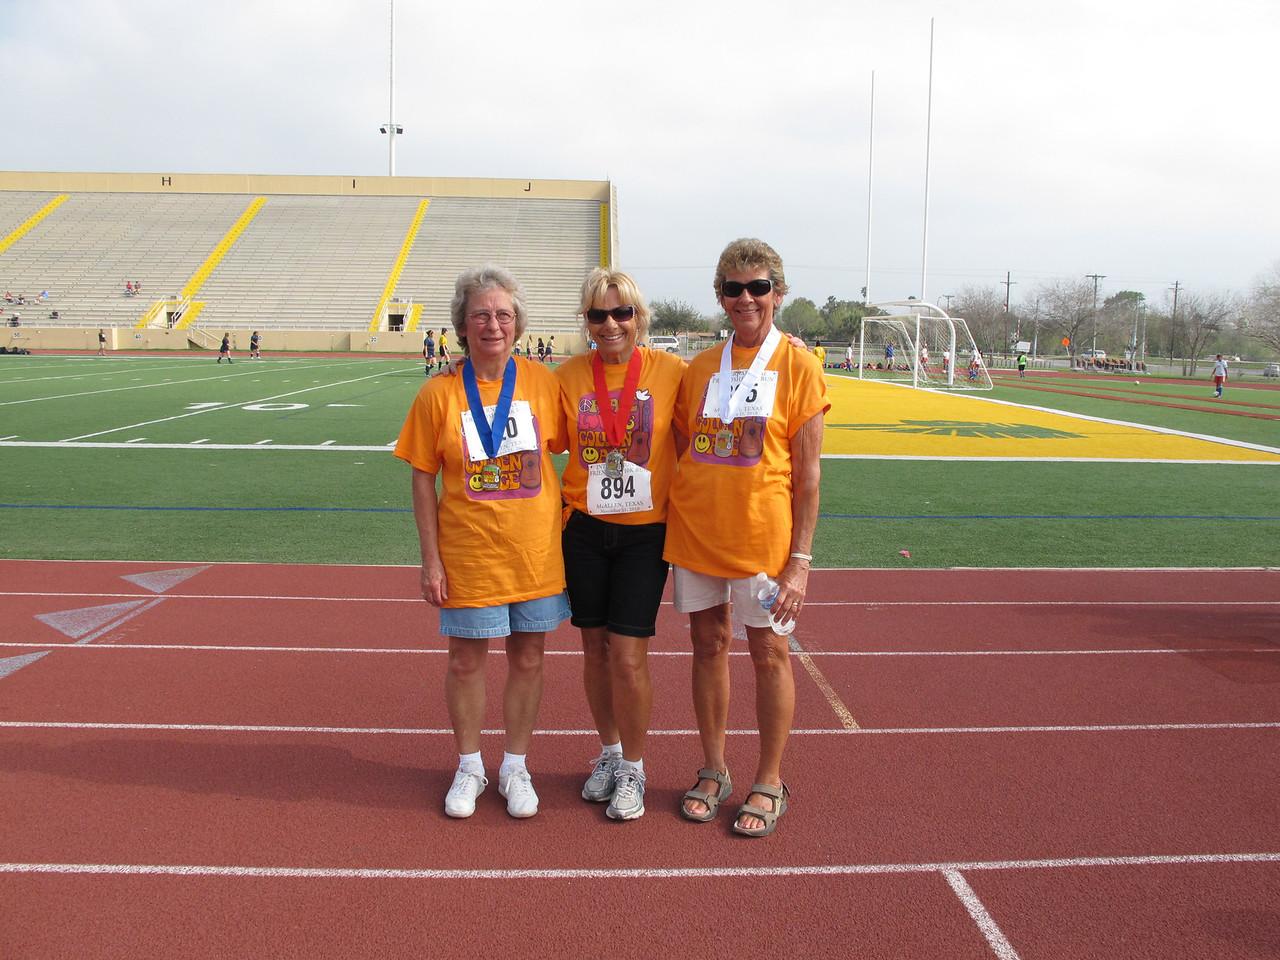 Racewalk Women 65-69 (L-R) 1st Place - Roseann Mitchell (Bit O Heaven), 2nd Place - Barbara Haug (Fiesta Village), 3rd Place - Mary Leonard (Texan Mobile)